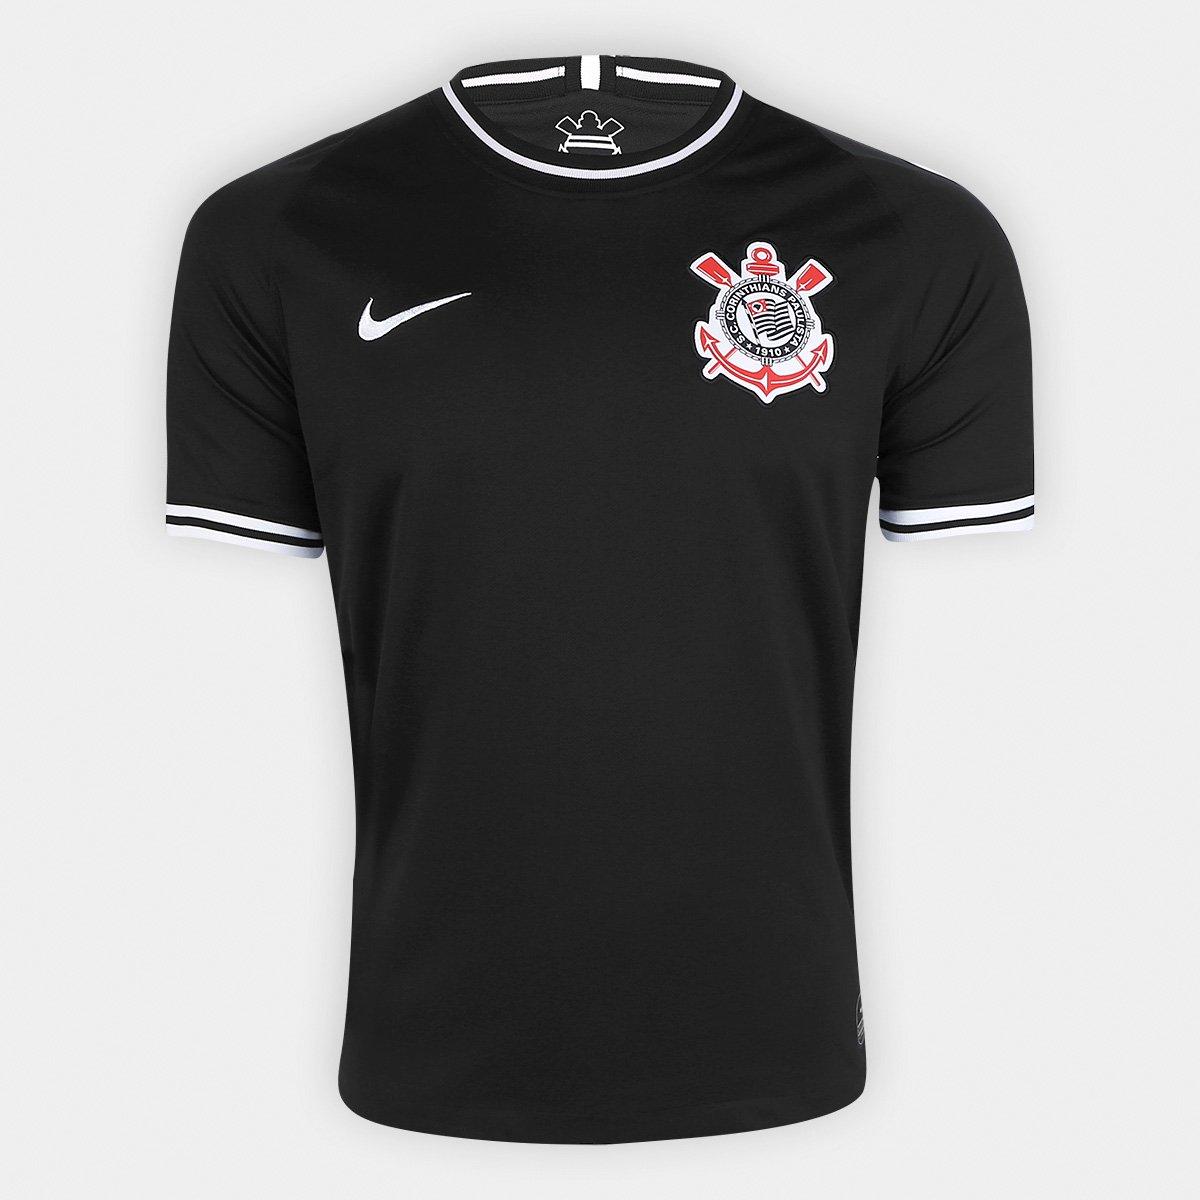 Camisa Corinthians II 19/20 s/nº Torcedor Nike Masculina - Tam: P